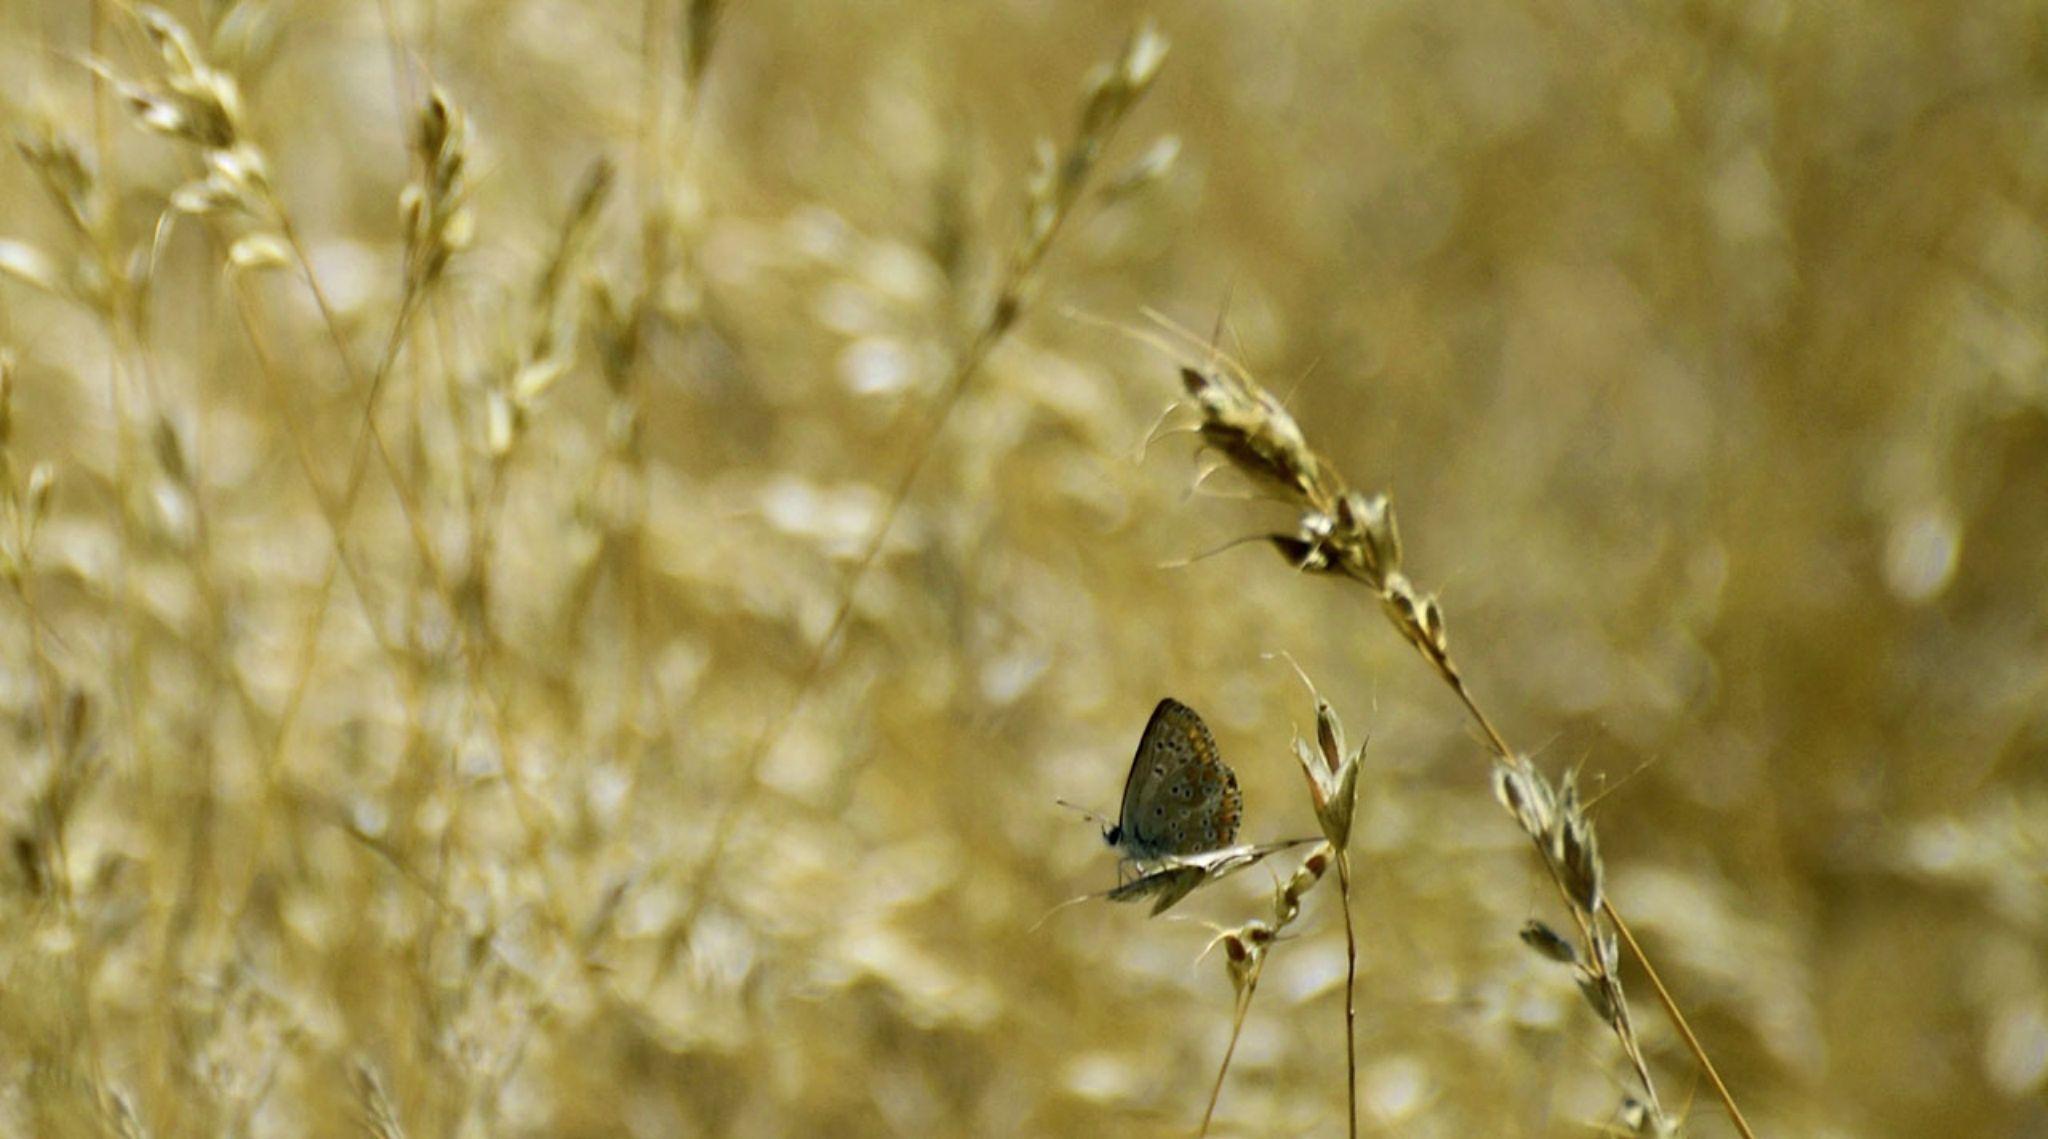 Between the Grass Hidden by Filiz Bariskan